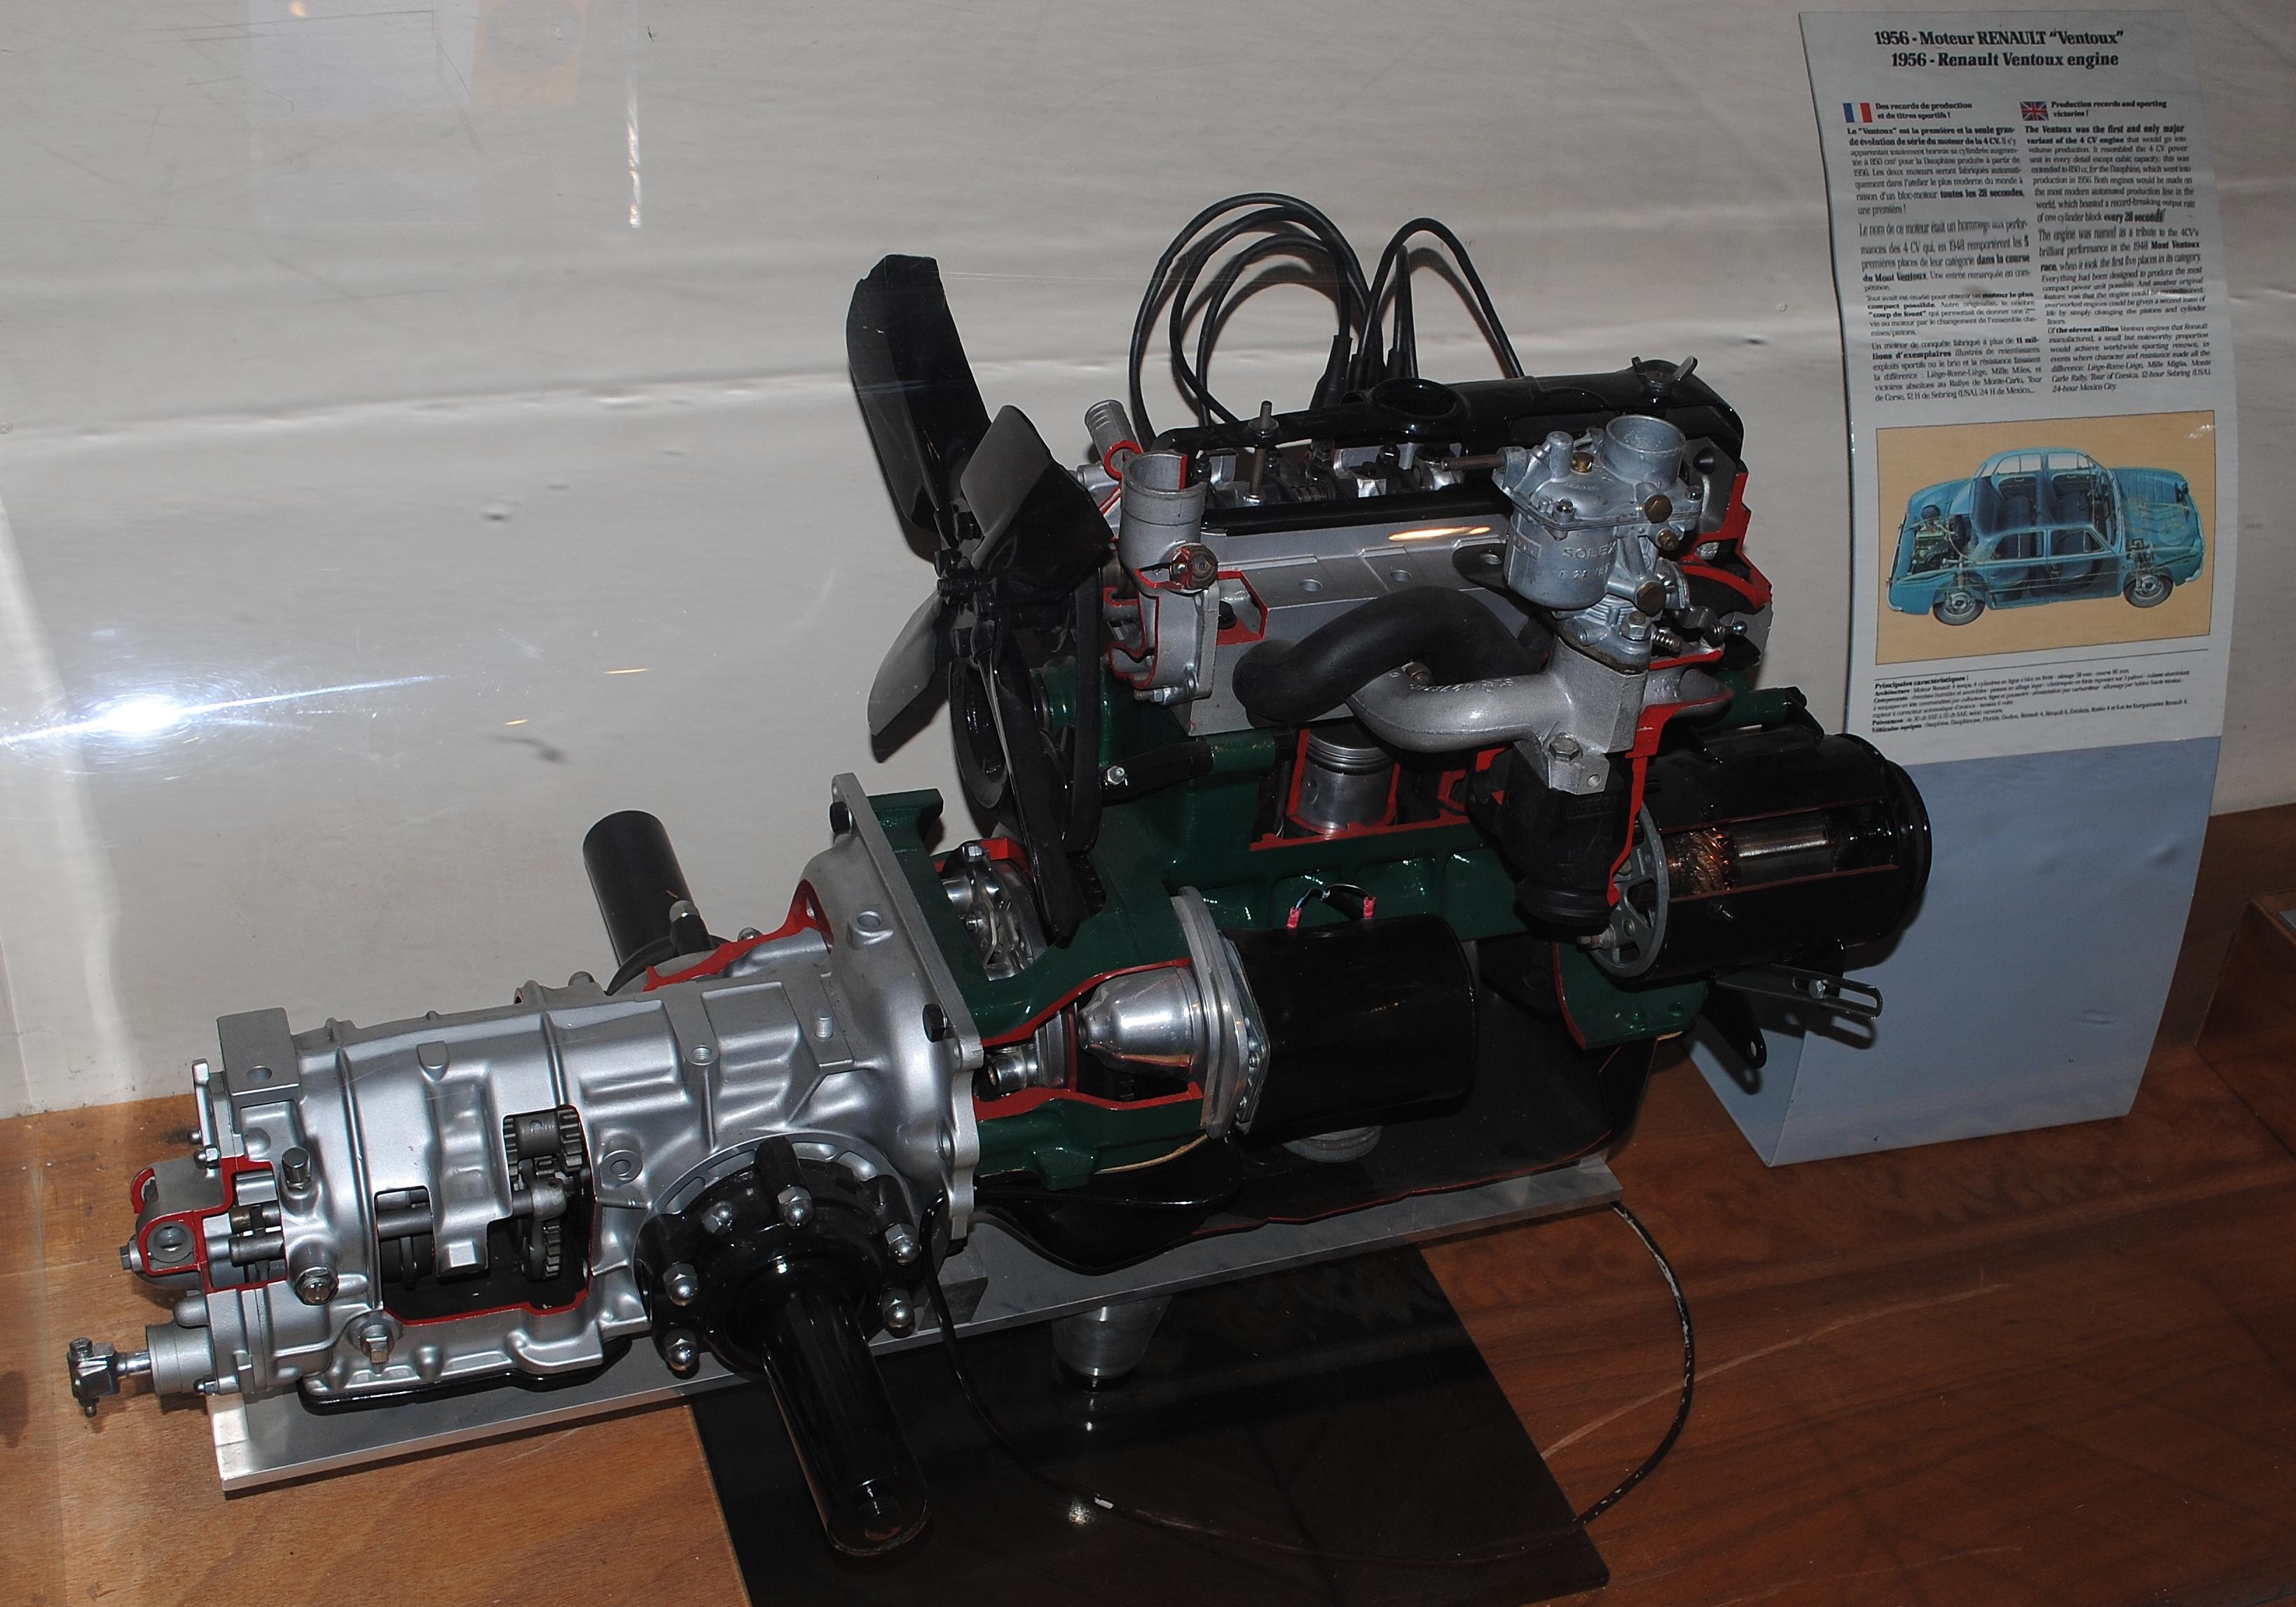 Renault Billancourt engine - Wikipedia